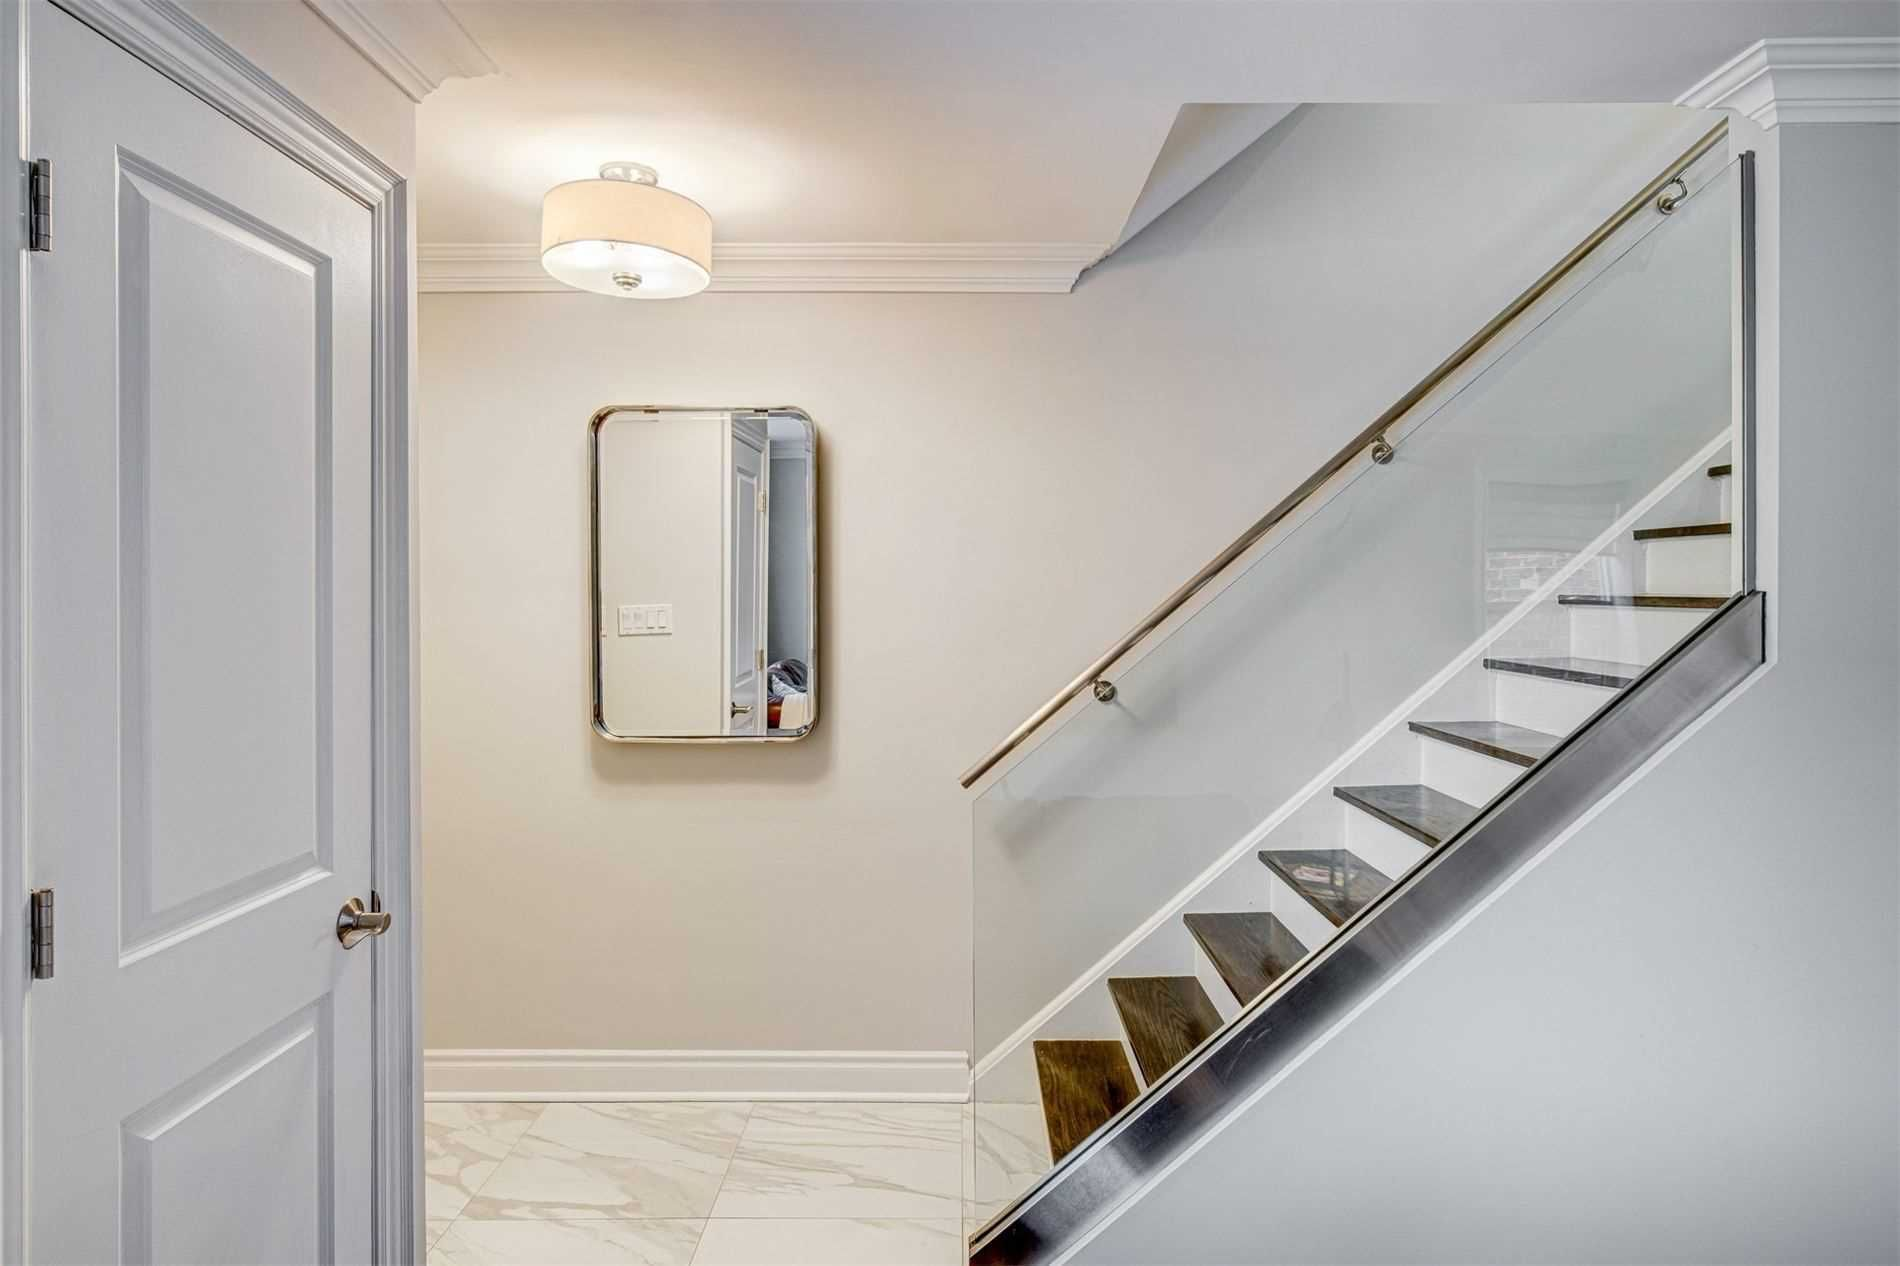 Photo 15: Photos: 92 Holborne Avenue in Toronto: Danforth Village-East York House (2-Storey) for sale (Toronto E03)  : MLS®# E5204452